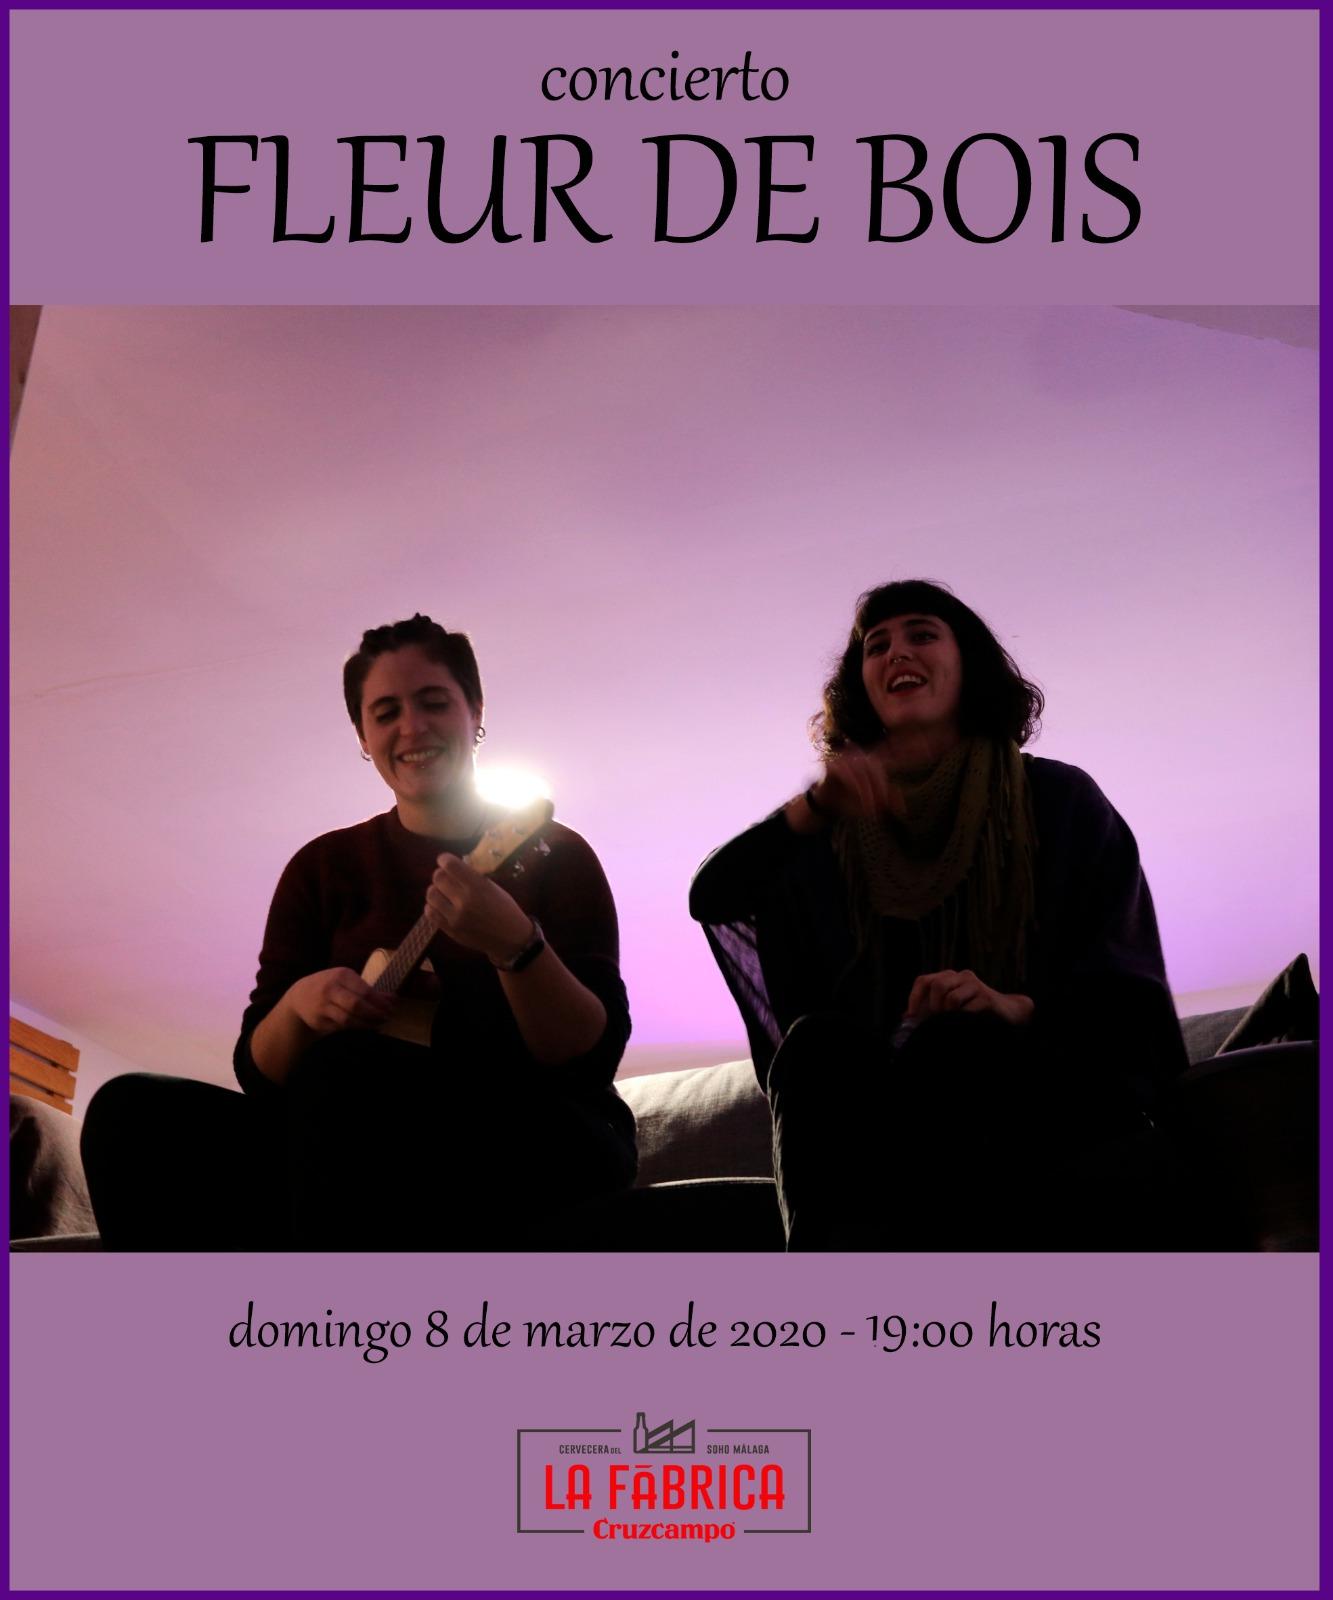 concierto fleur de bois